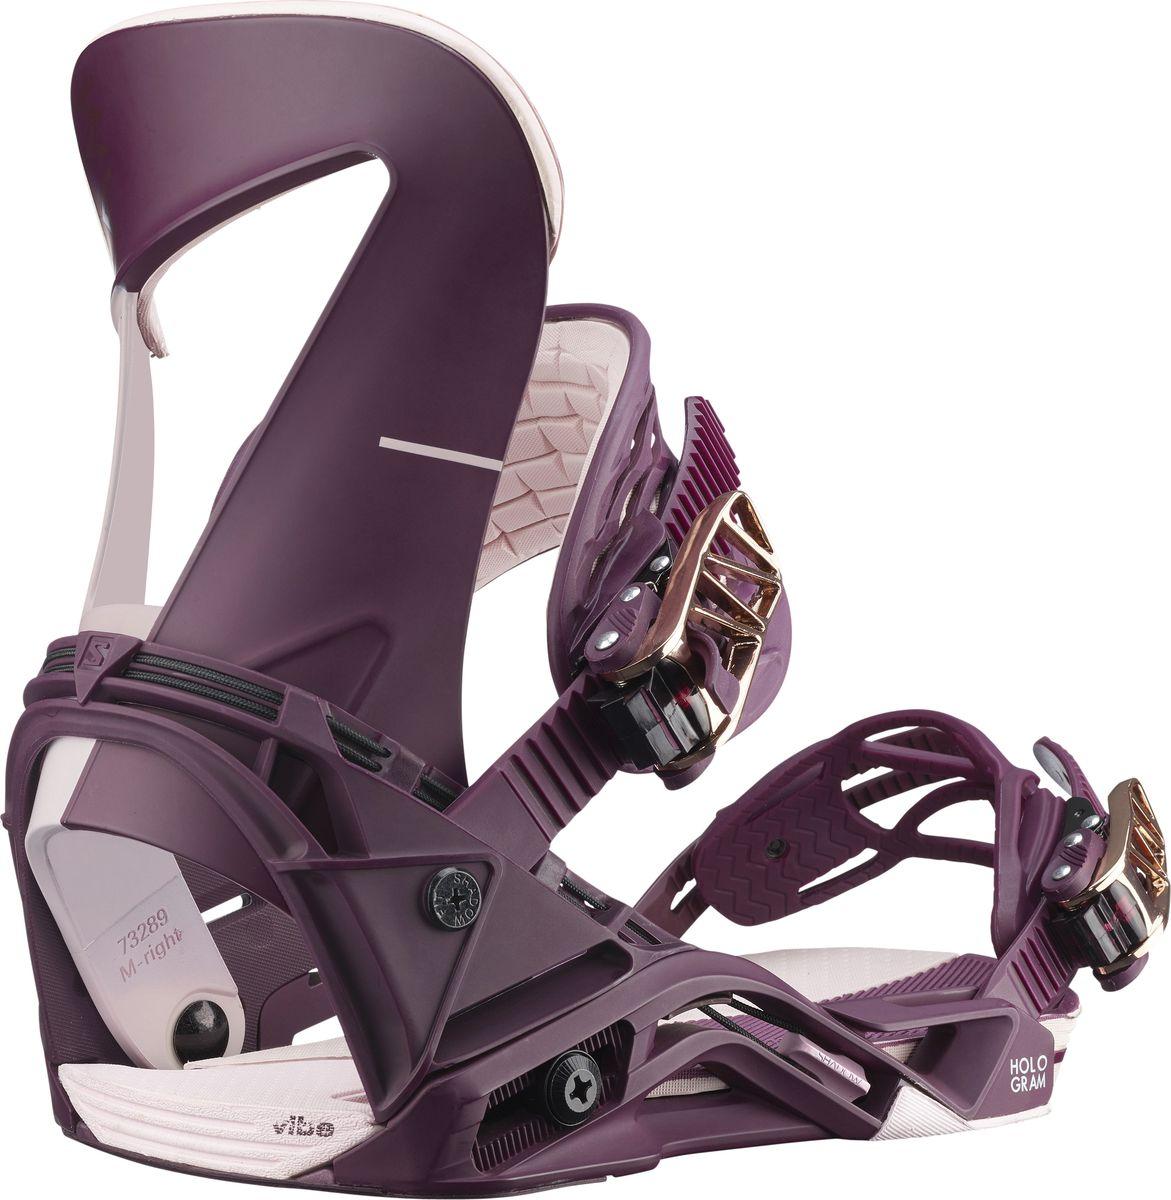 Крепления для сноуборда Salomon Hologram W, цвет: фиолетовый. Размер M (39,5-44) salomon w max 12 с креплениями m xt10 ti w c9 16 17